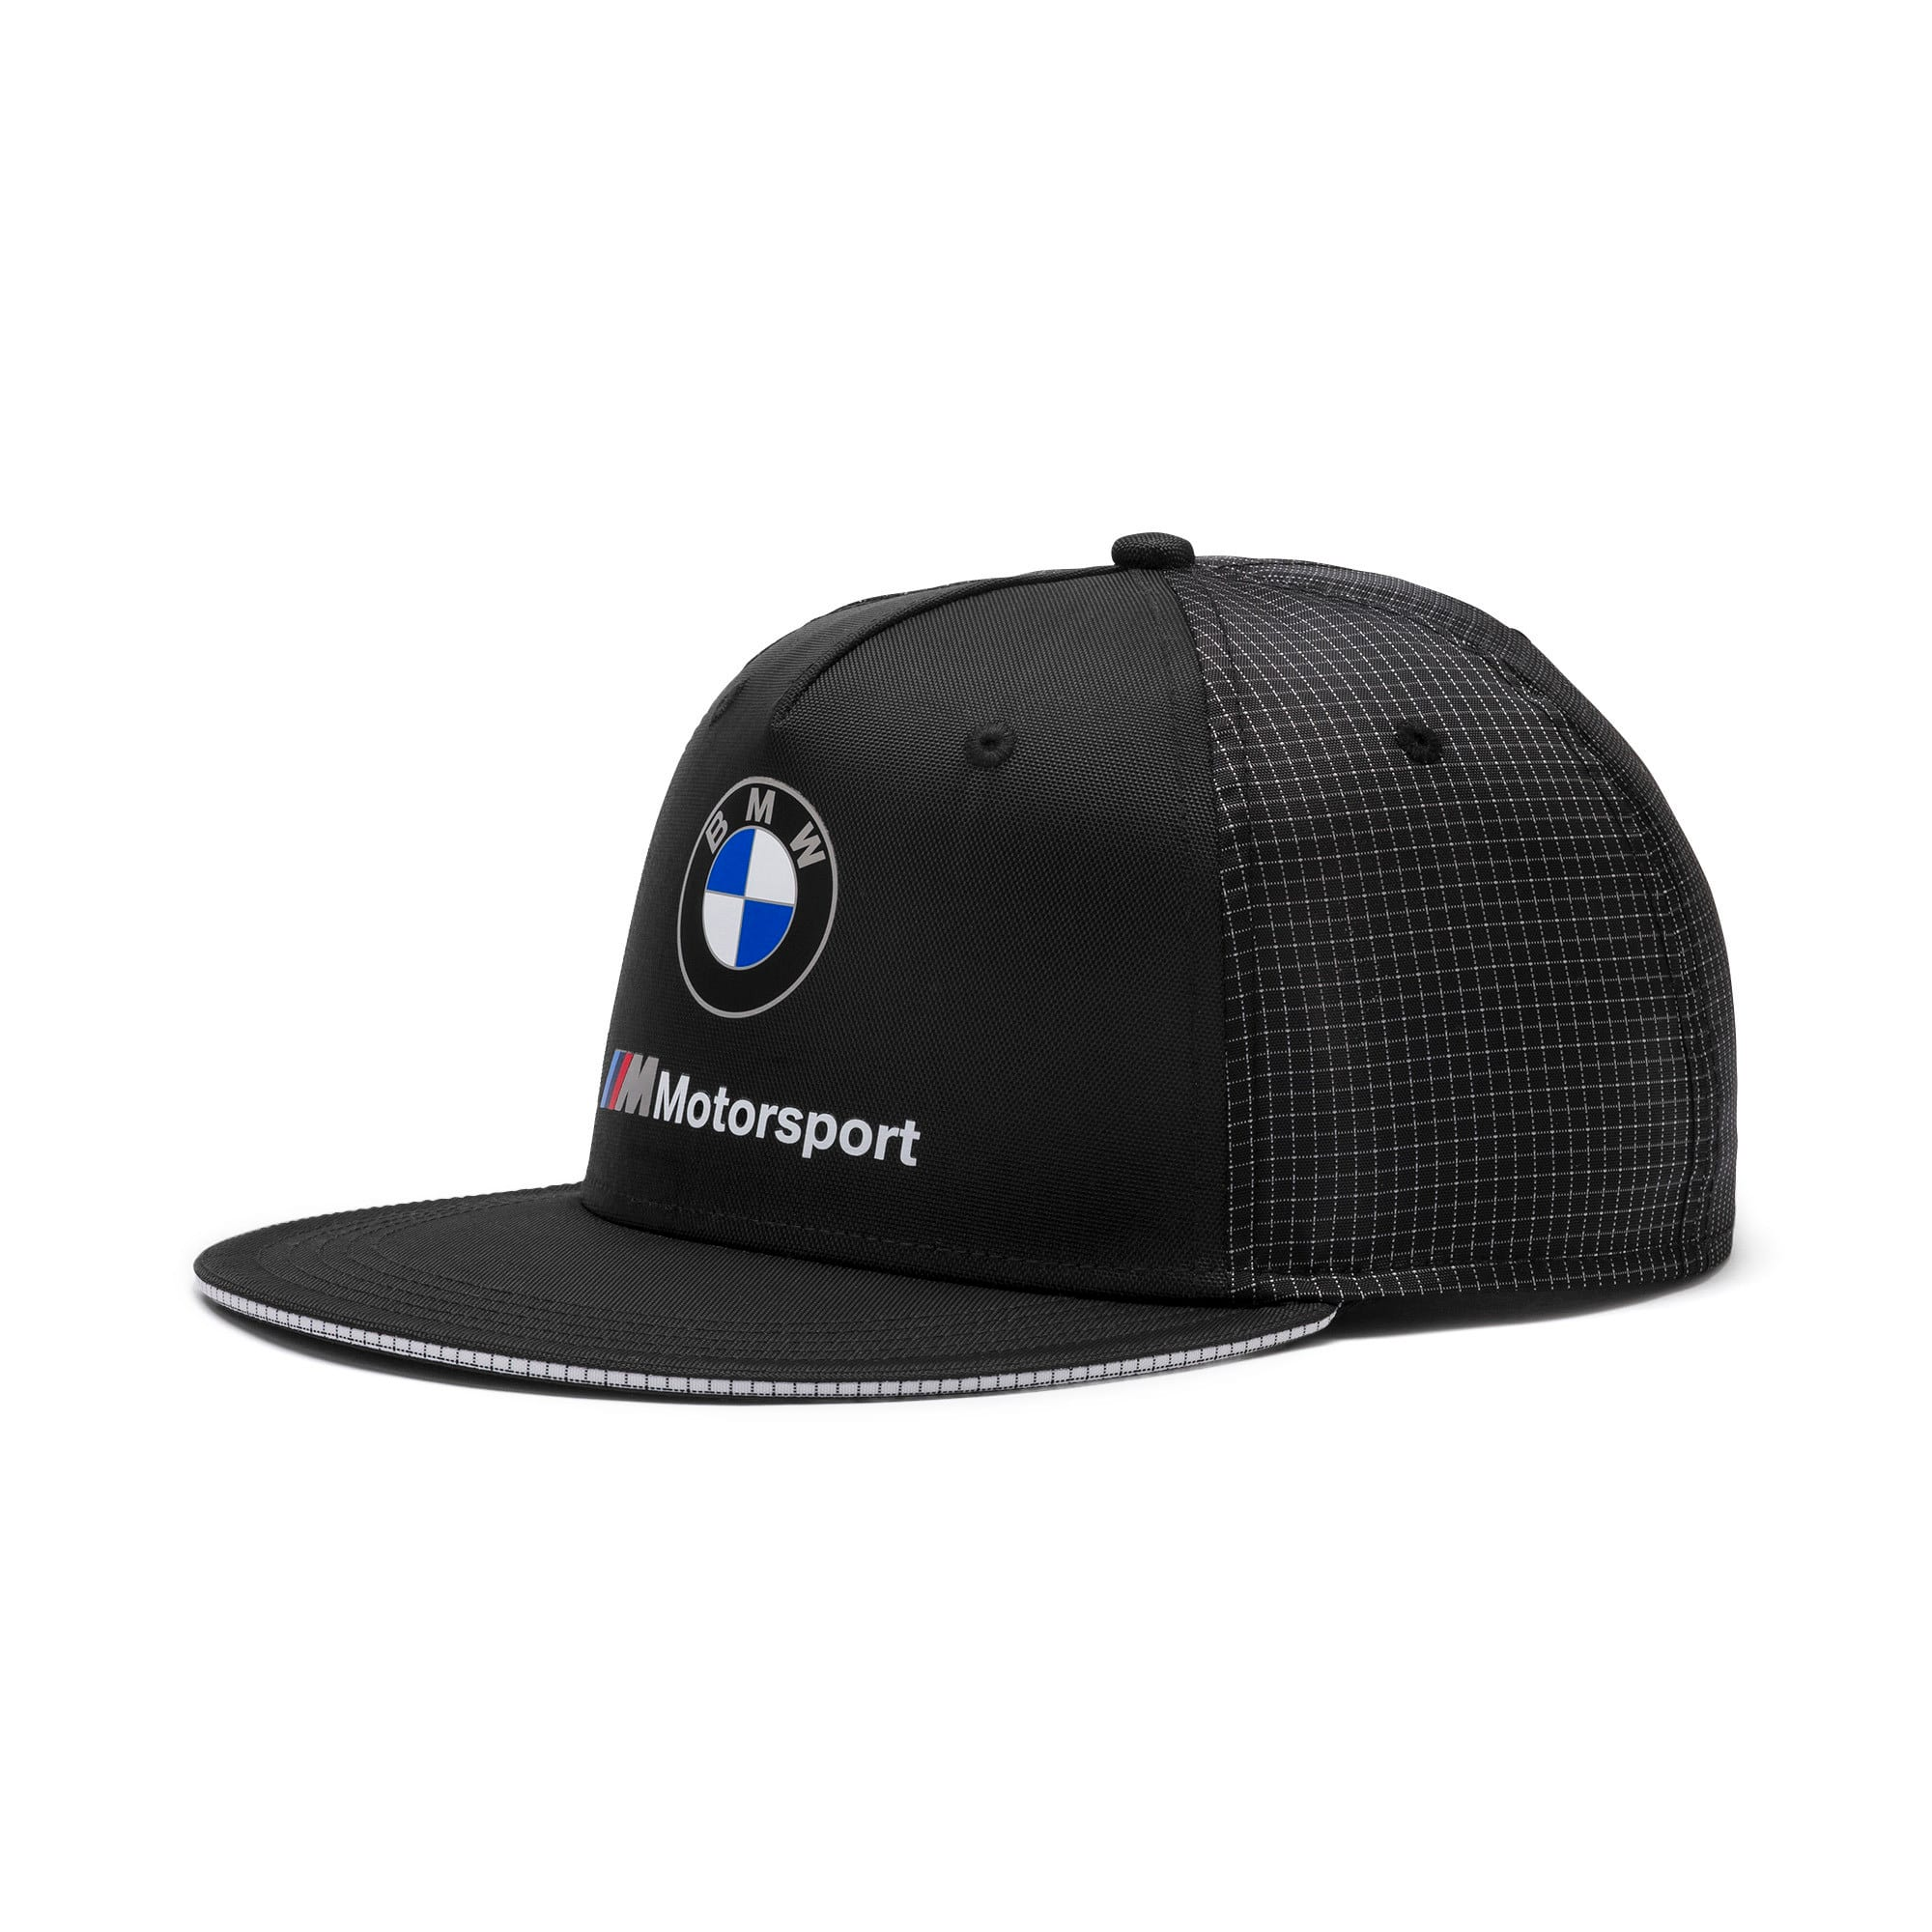 Thumbnail 1 of BMW M Motorsport Flat Brim Cap, Puma Black, medium